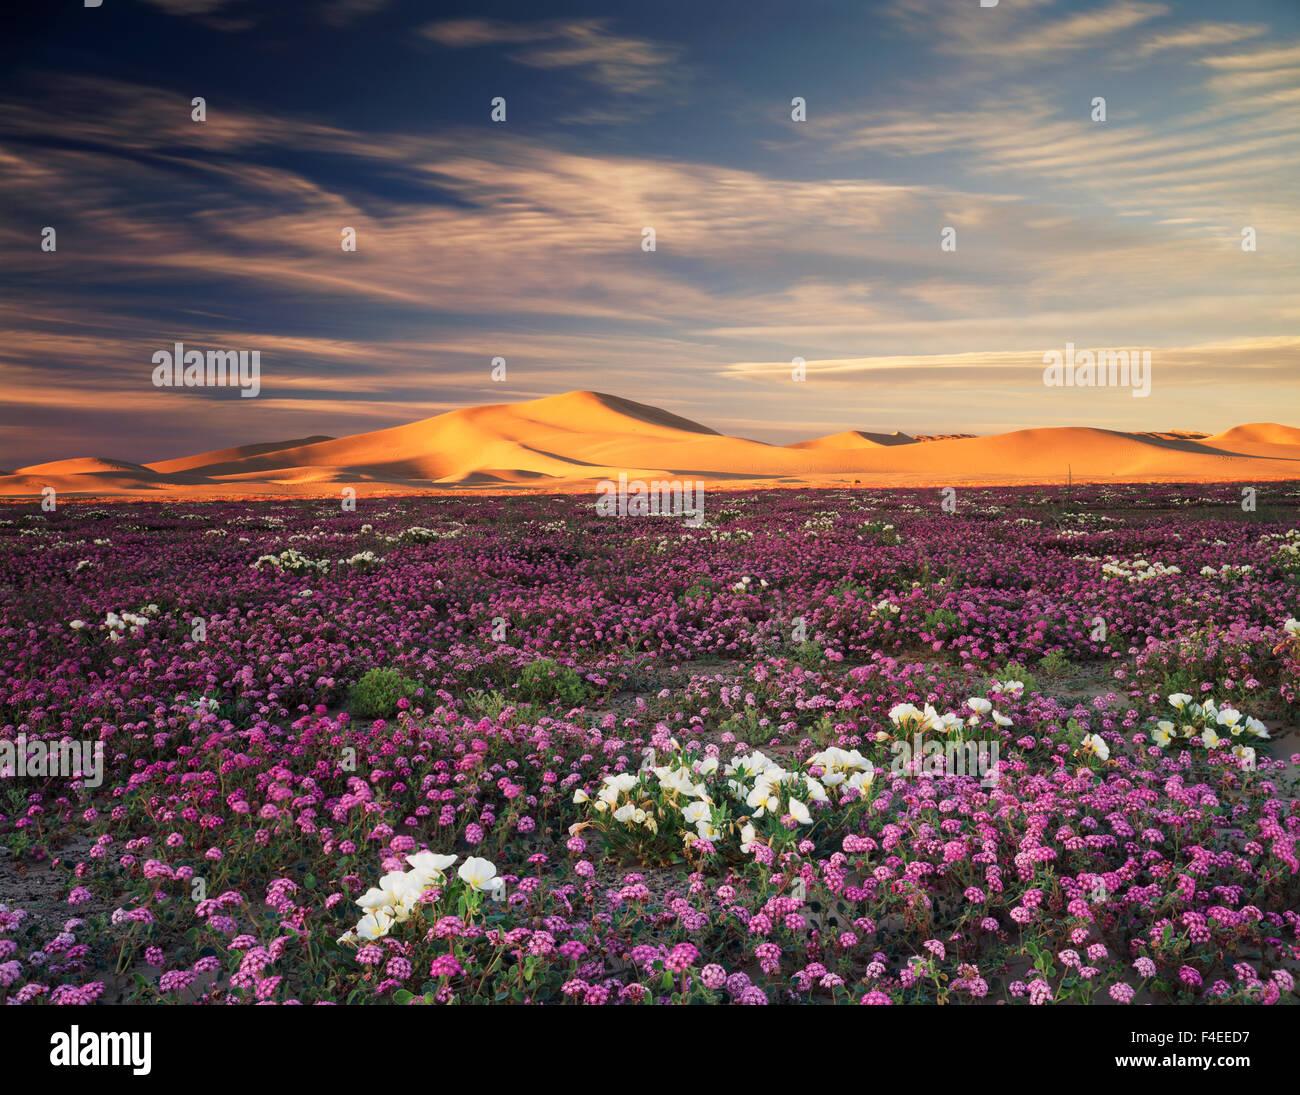 California, Sand Verbena Wildflowers (Abronia villosa) and Dune Evening Primrose (Oenothera deltoides) flowers on - Stock Image